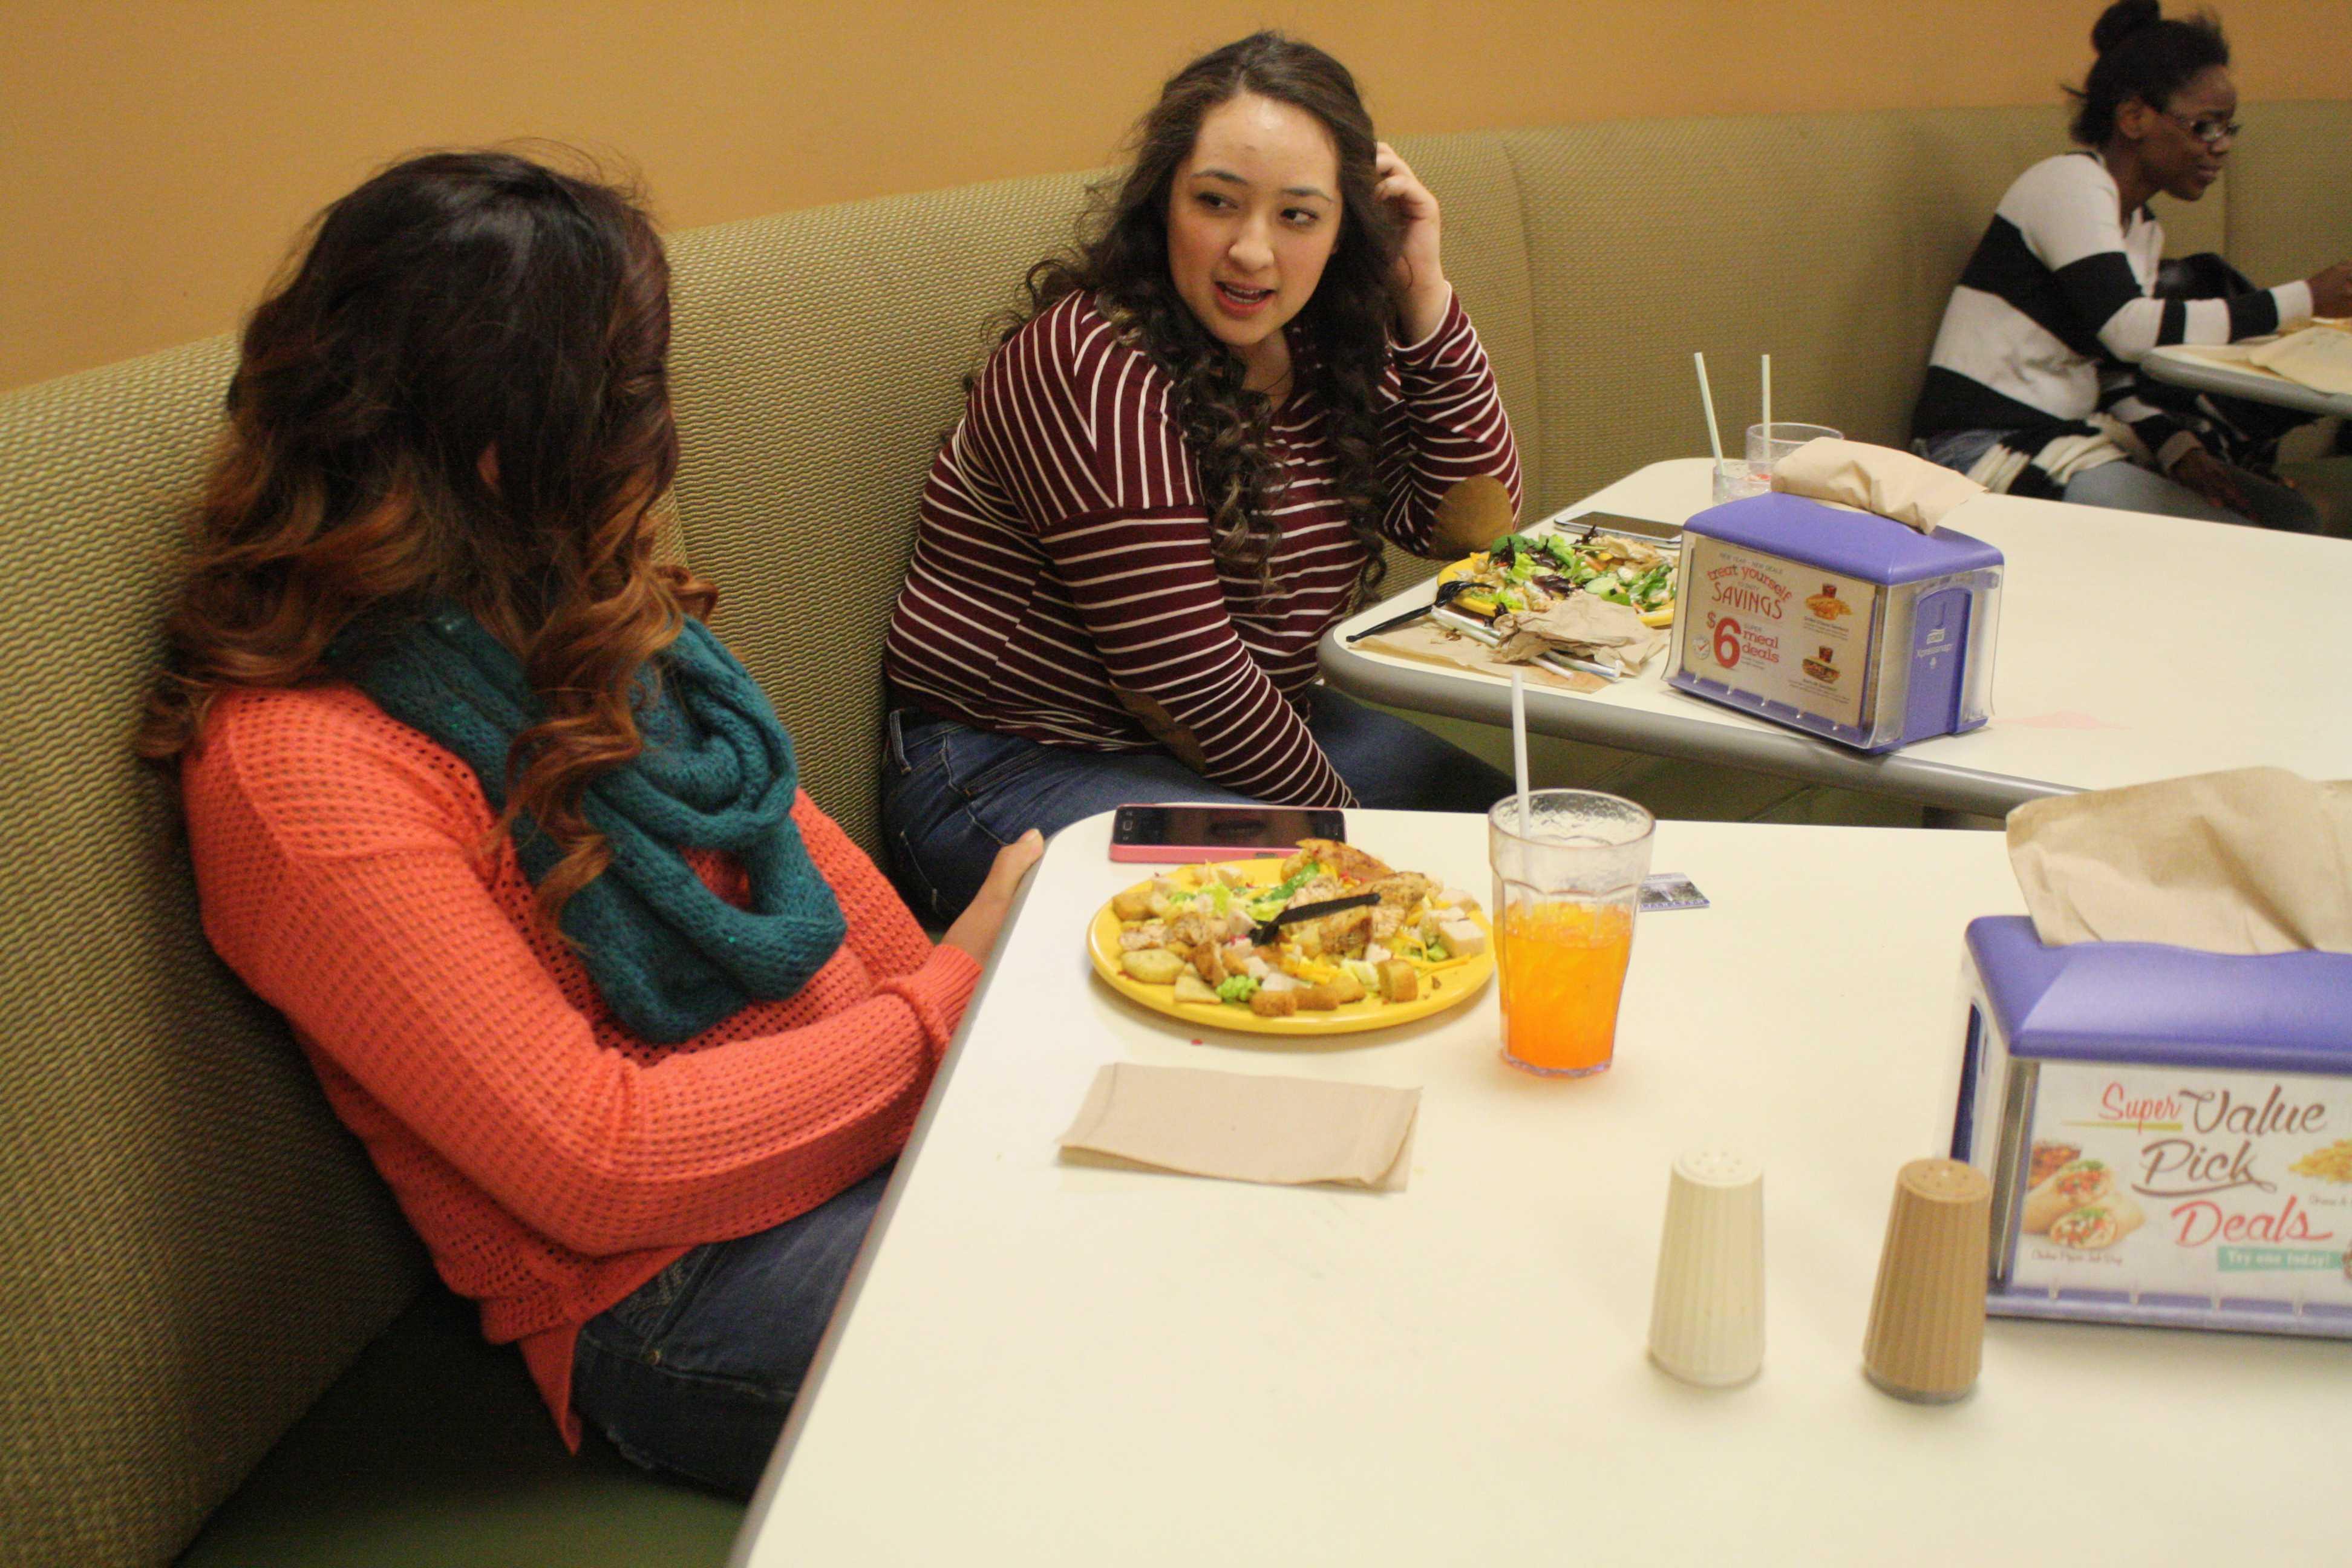 Students discuss diet options, food service responds